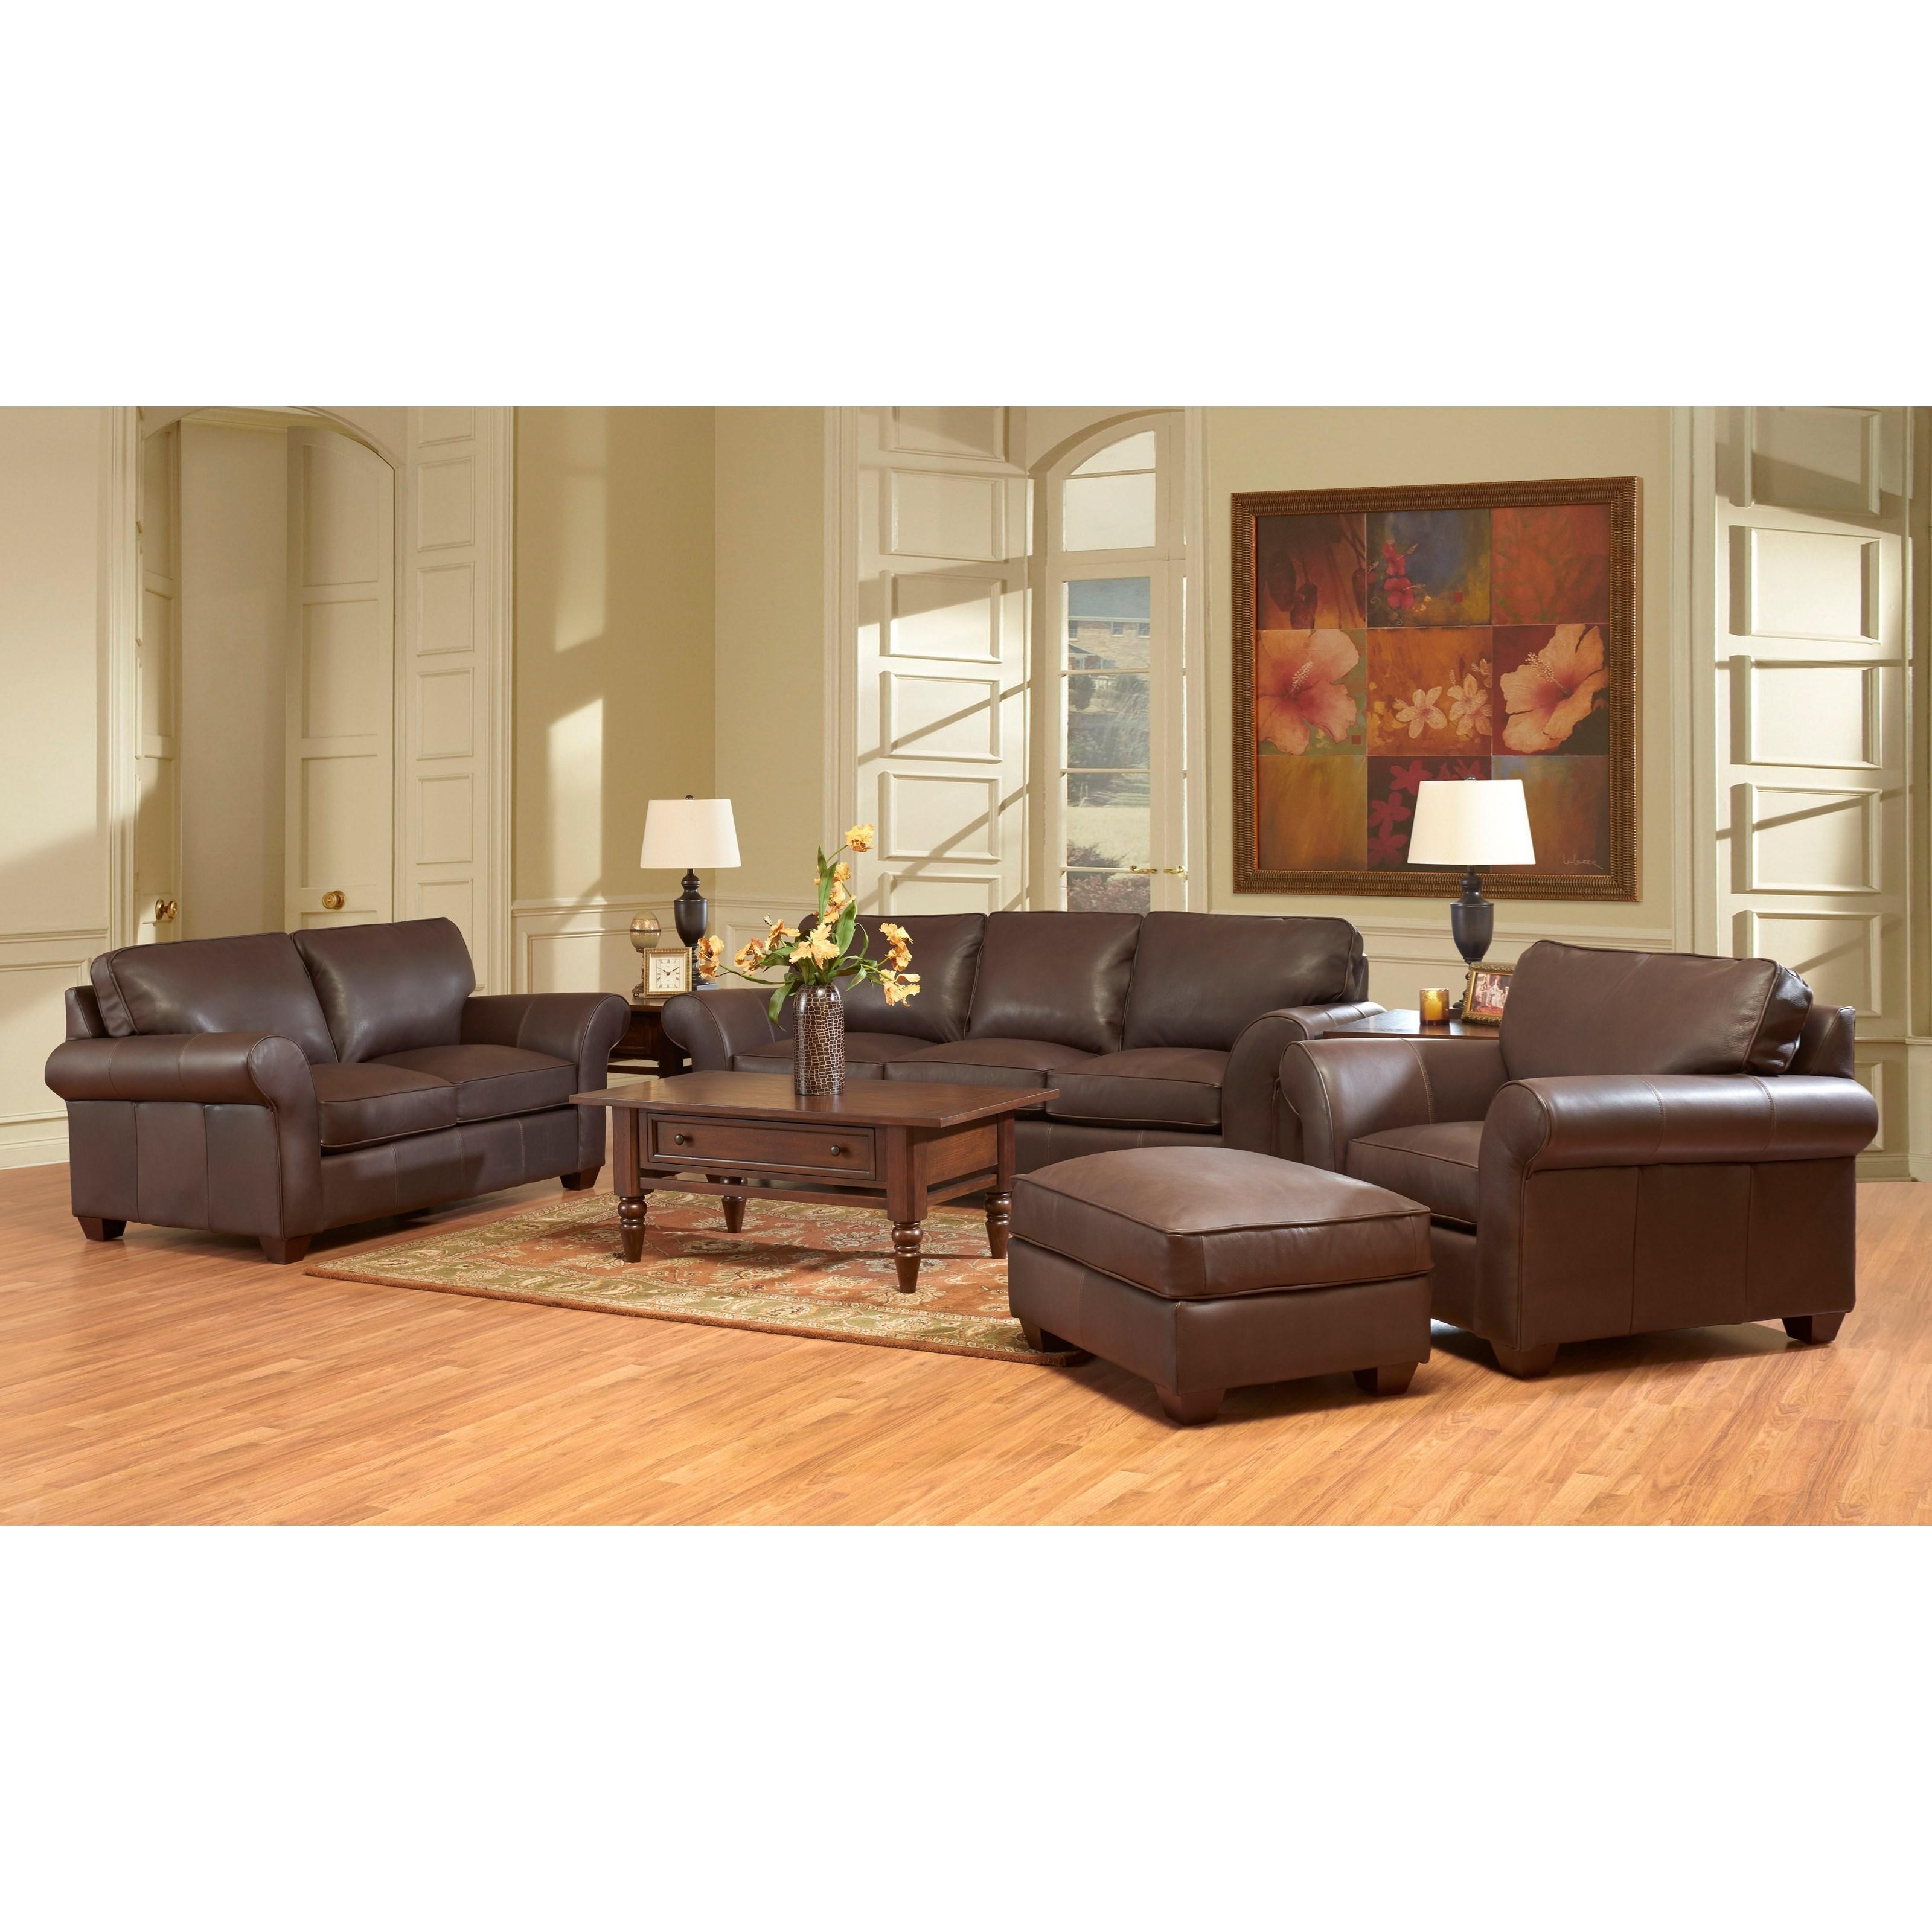 Klaussner Heathmont Living Room Group Dunk Bright Furniture Station